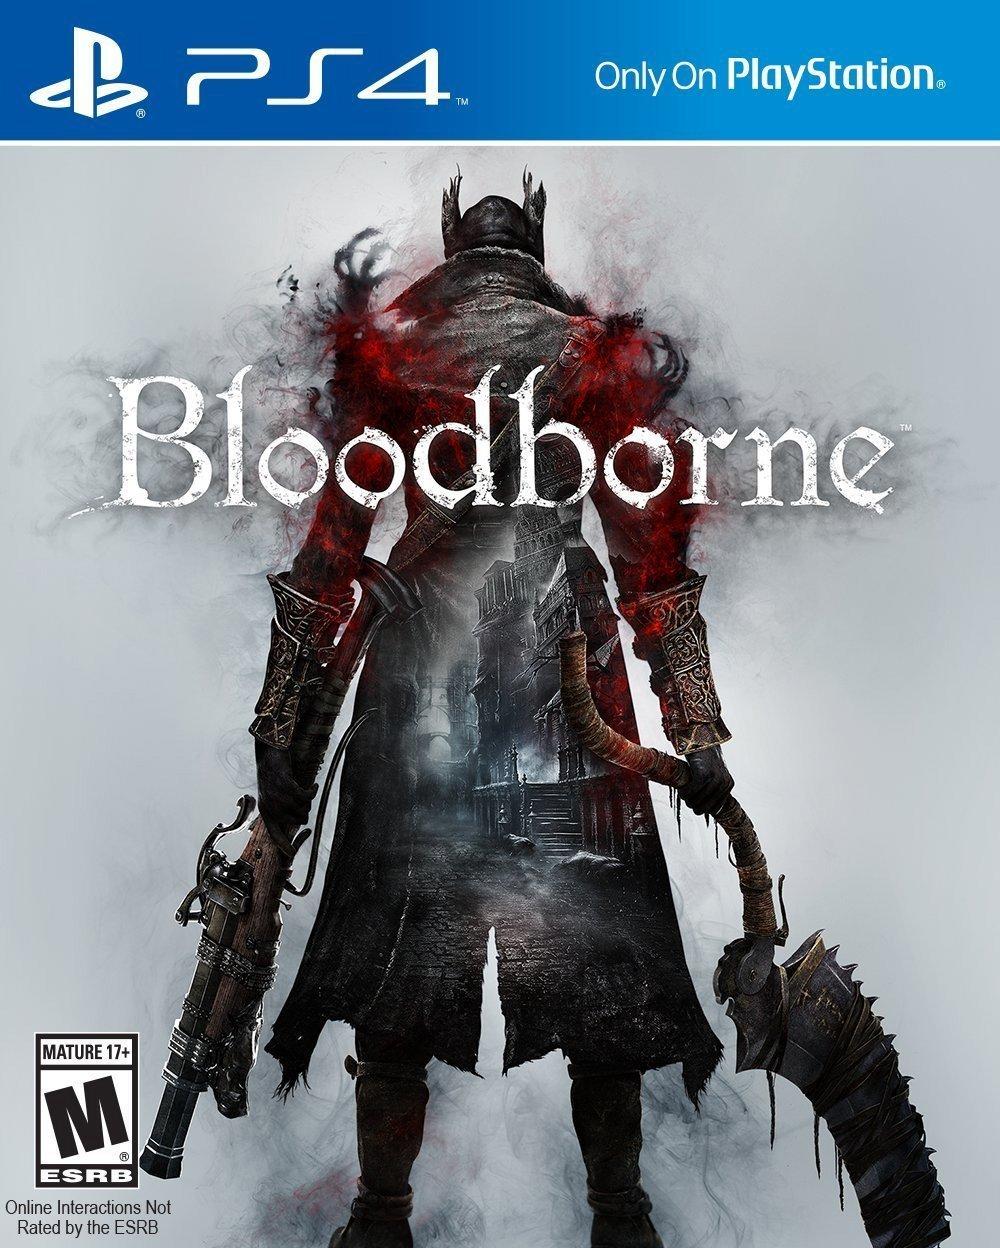 Bloodborne (PS4) $19.99 ($15.99 w/ GCU), The Elder Scrolls Online: Tamriel Unlimited (PS4 or Xbox One) $19.99 ($15.99 w/ GCU) & More + Free Store Pickup